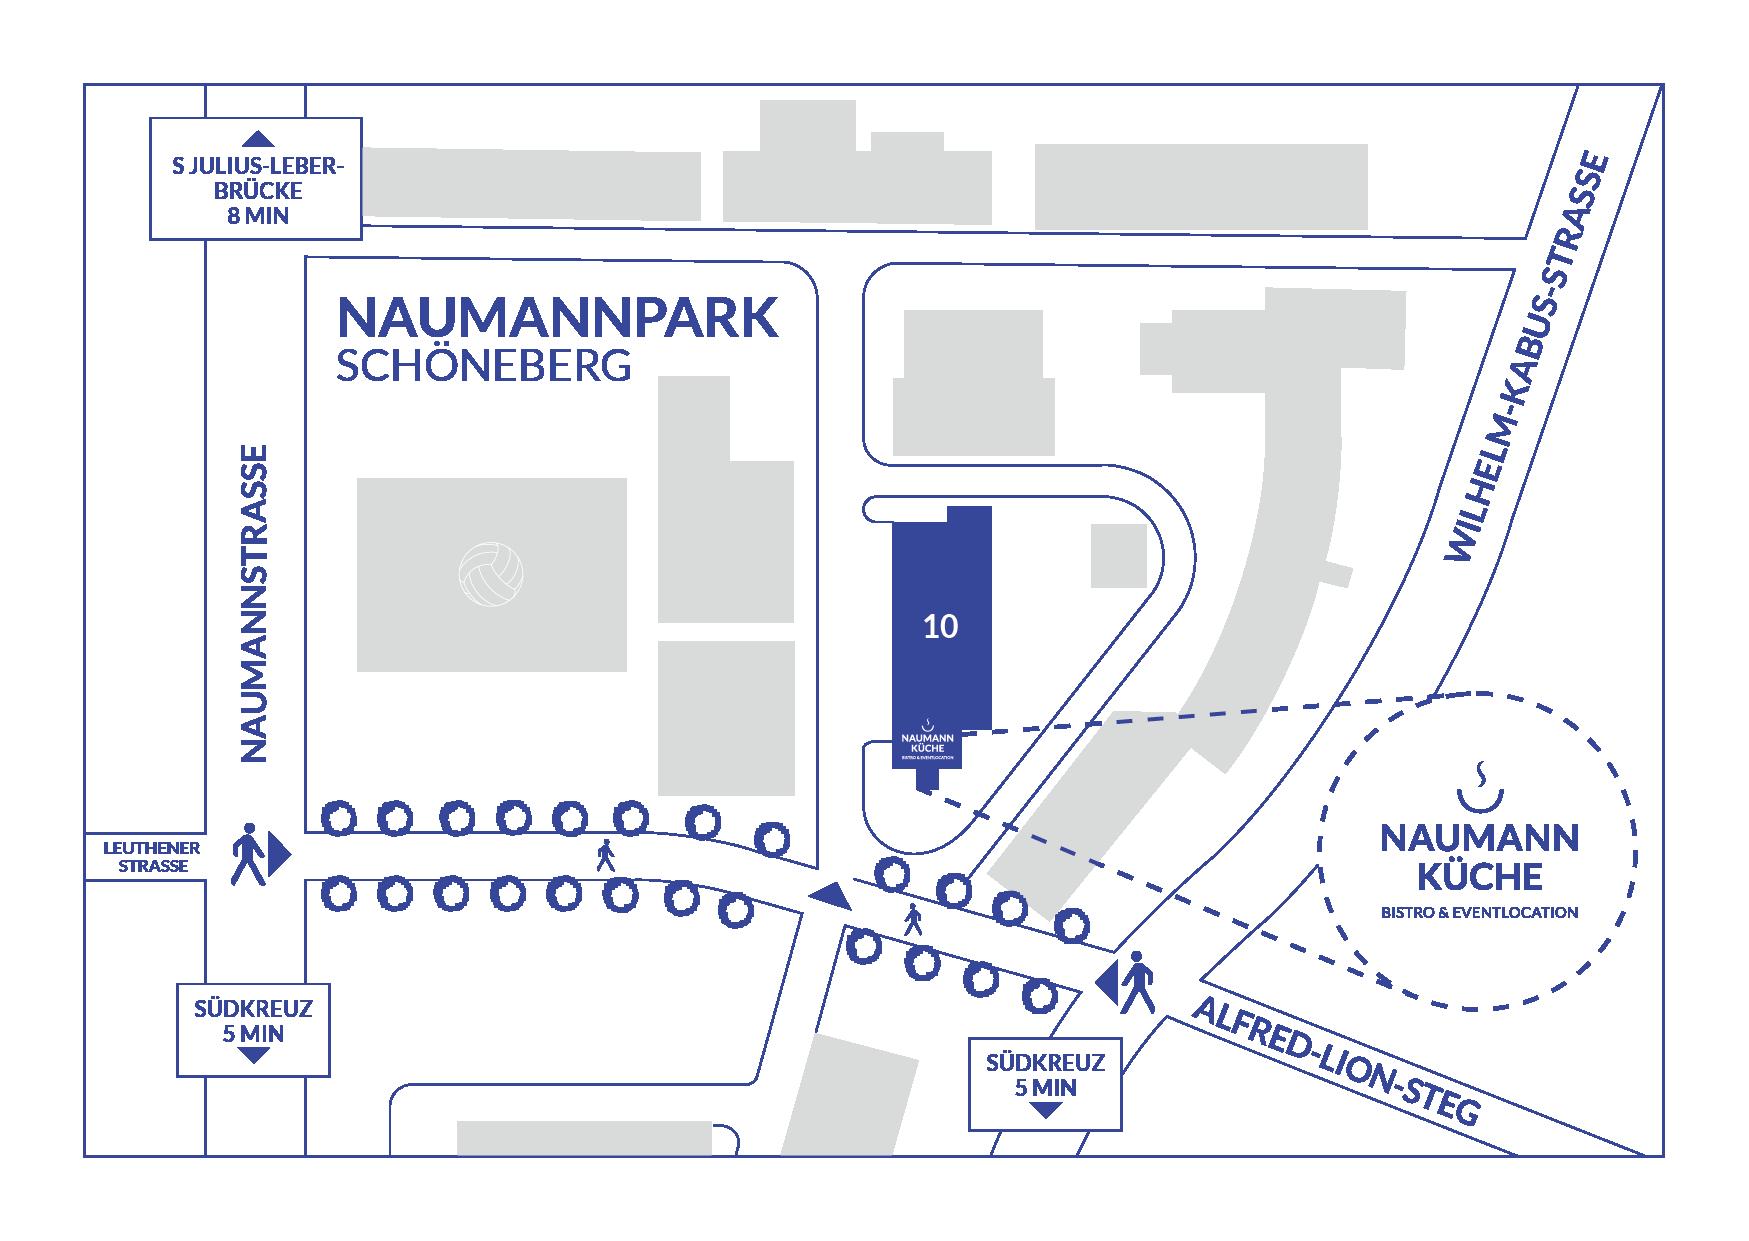 NAUMANN KÜCHE Lageplan.png